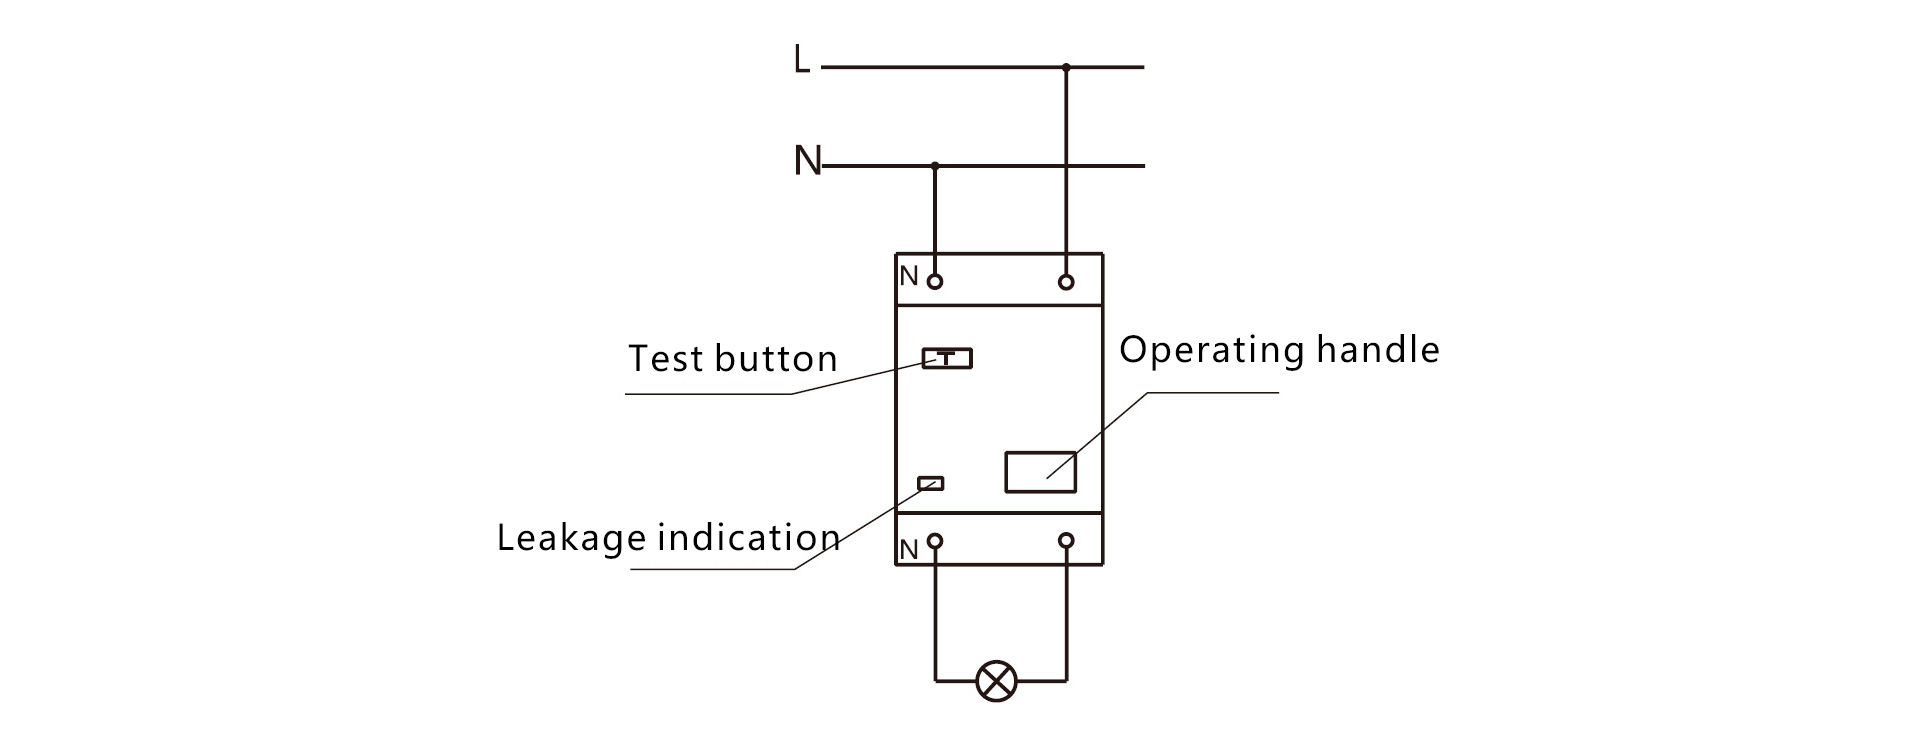 Wiring diagram. Keywords: earth leakage switch , electric leakage Circuit  Breaker